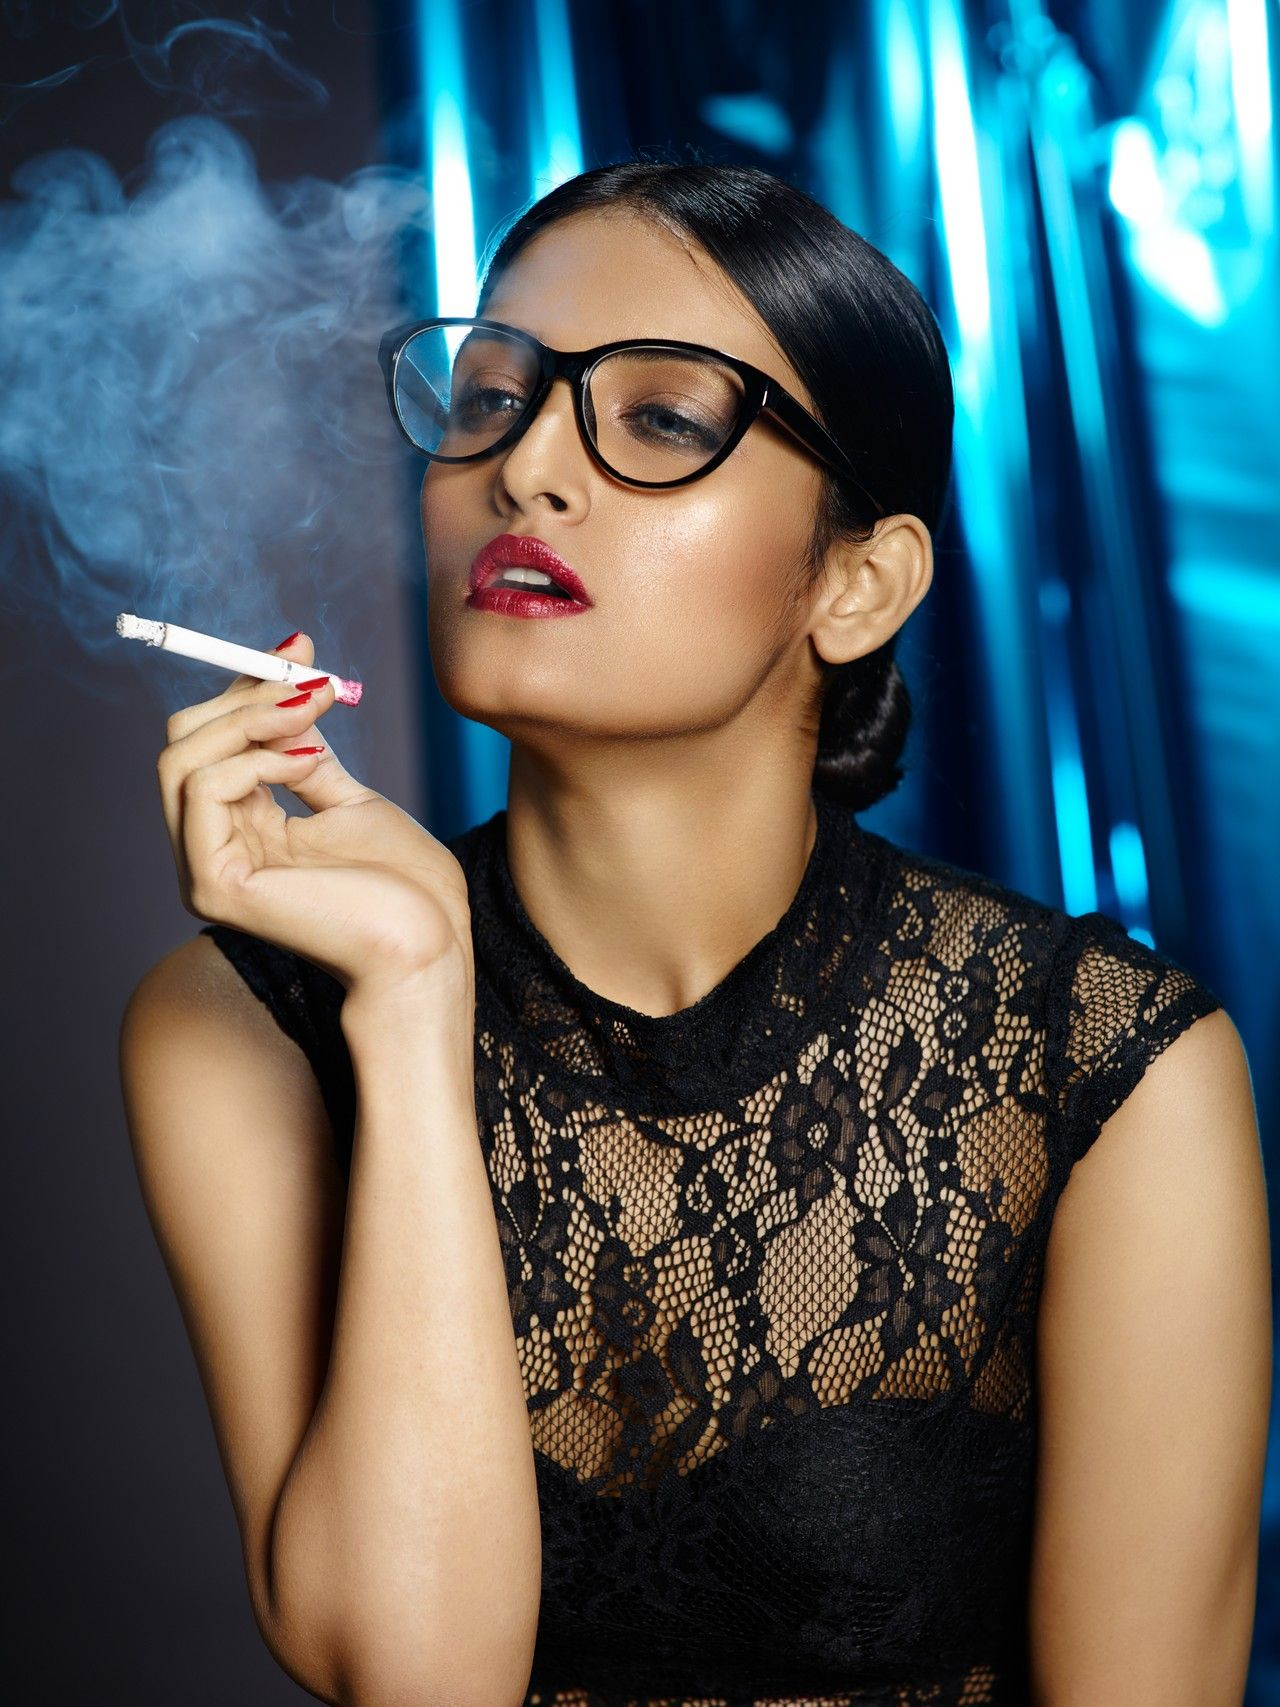 Ebony shemale smoking cigarette